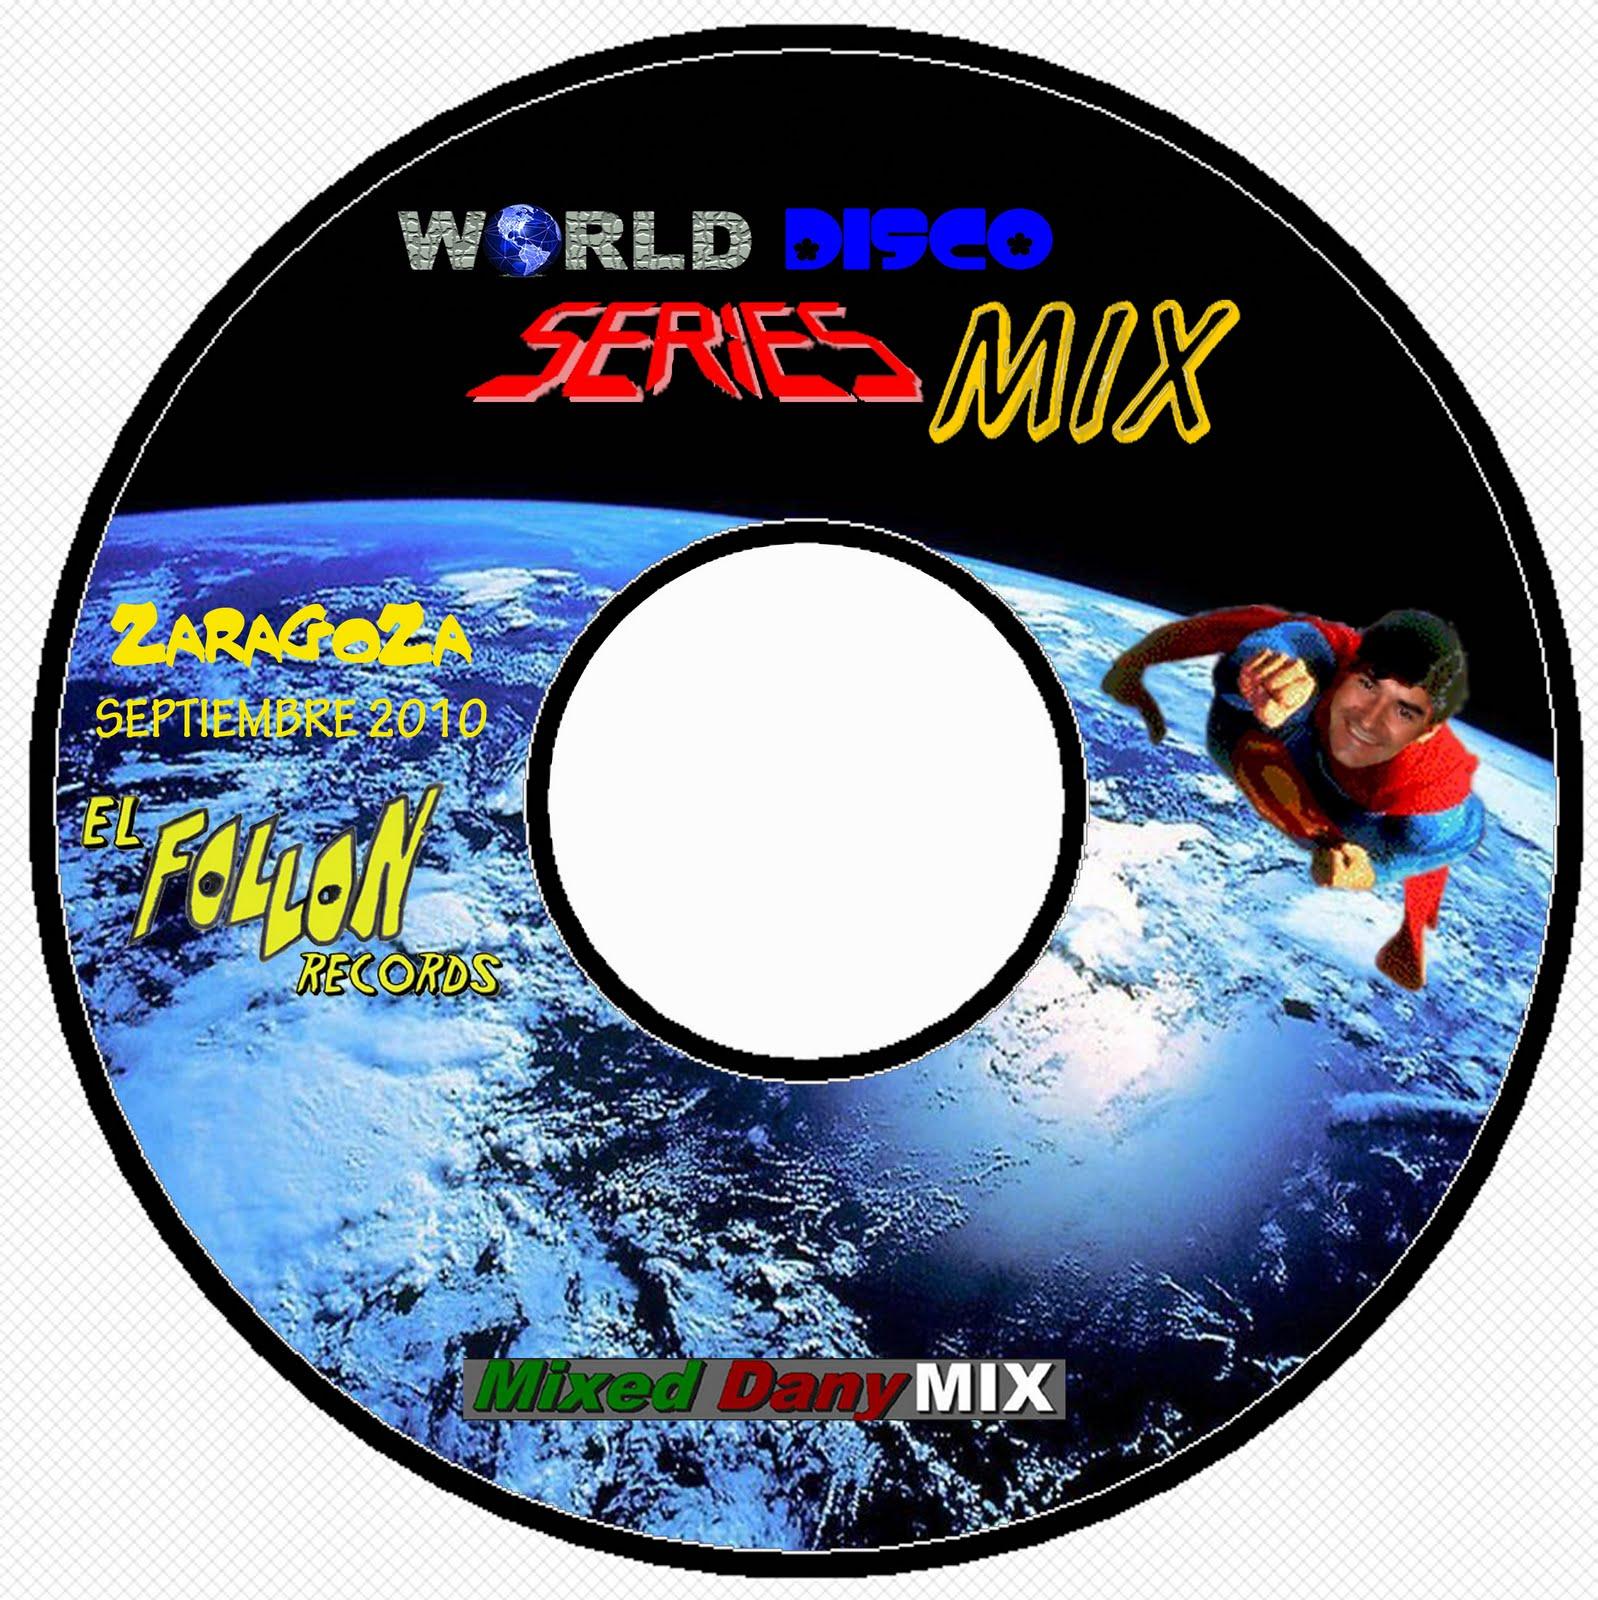 http://1.bp.blogspot.com/_geSC84USVWA/TI4_HhbKs9I/AAAAAAAAALo/WtS7b72gftE/s1600/Word+Disco+Mix+Series+Vol+01-05-Disco.jpg